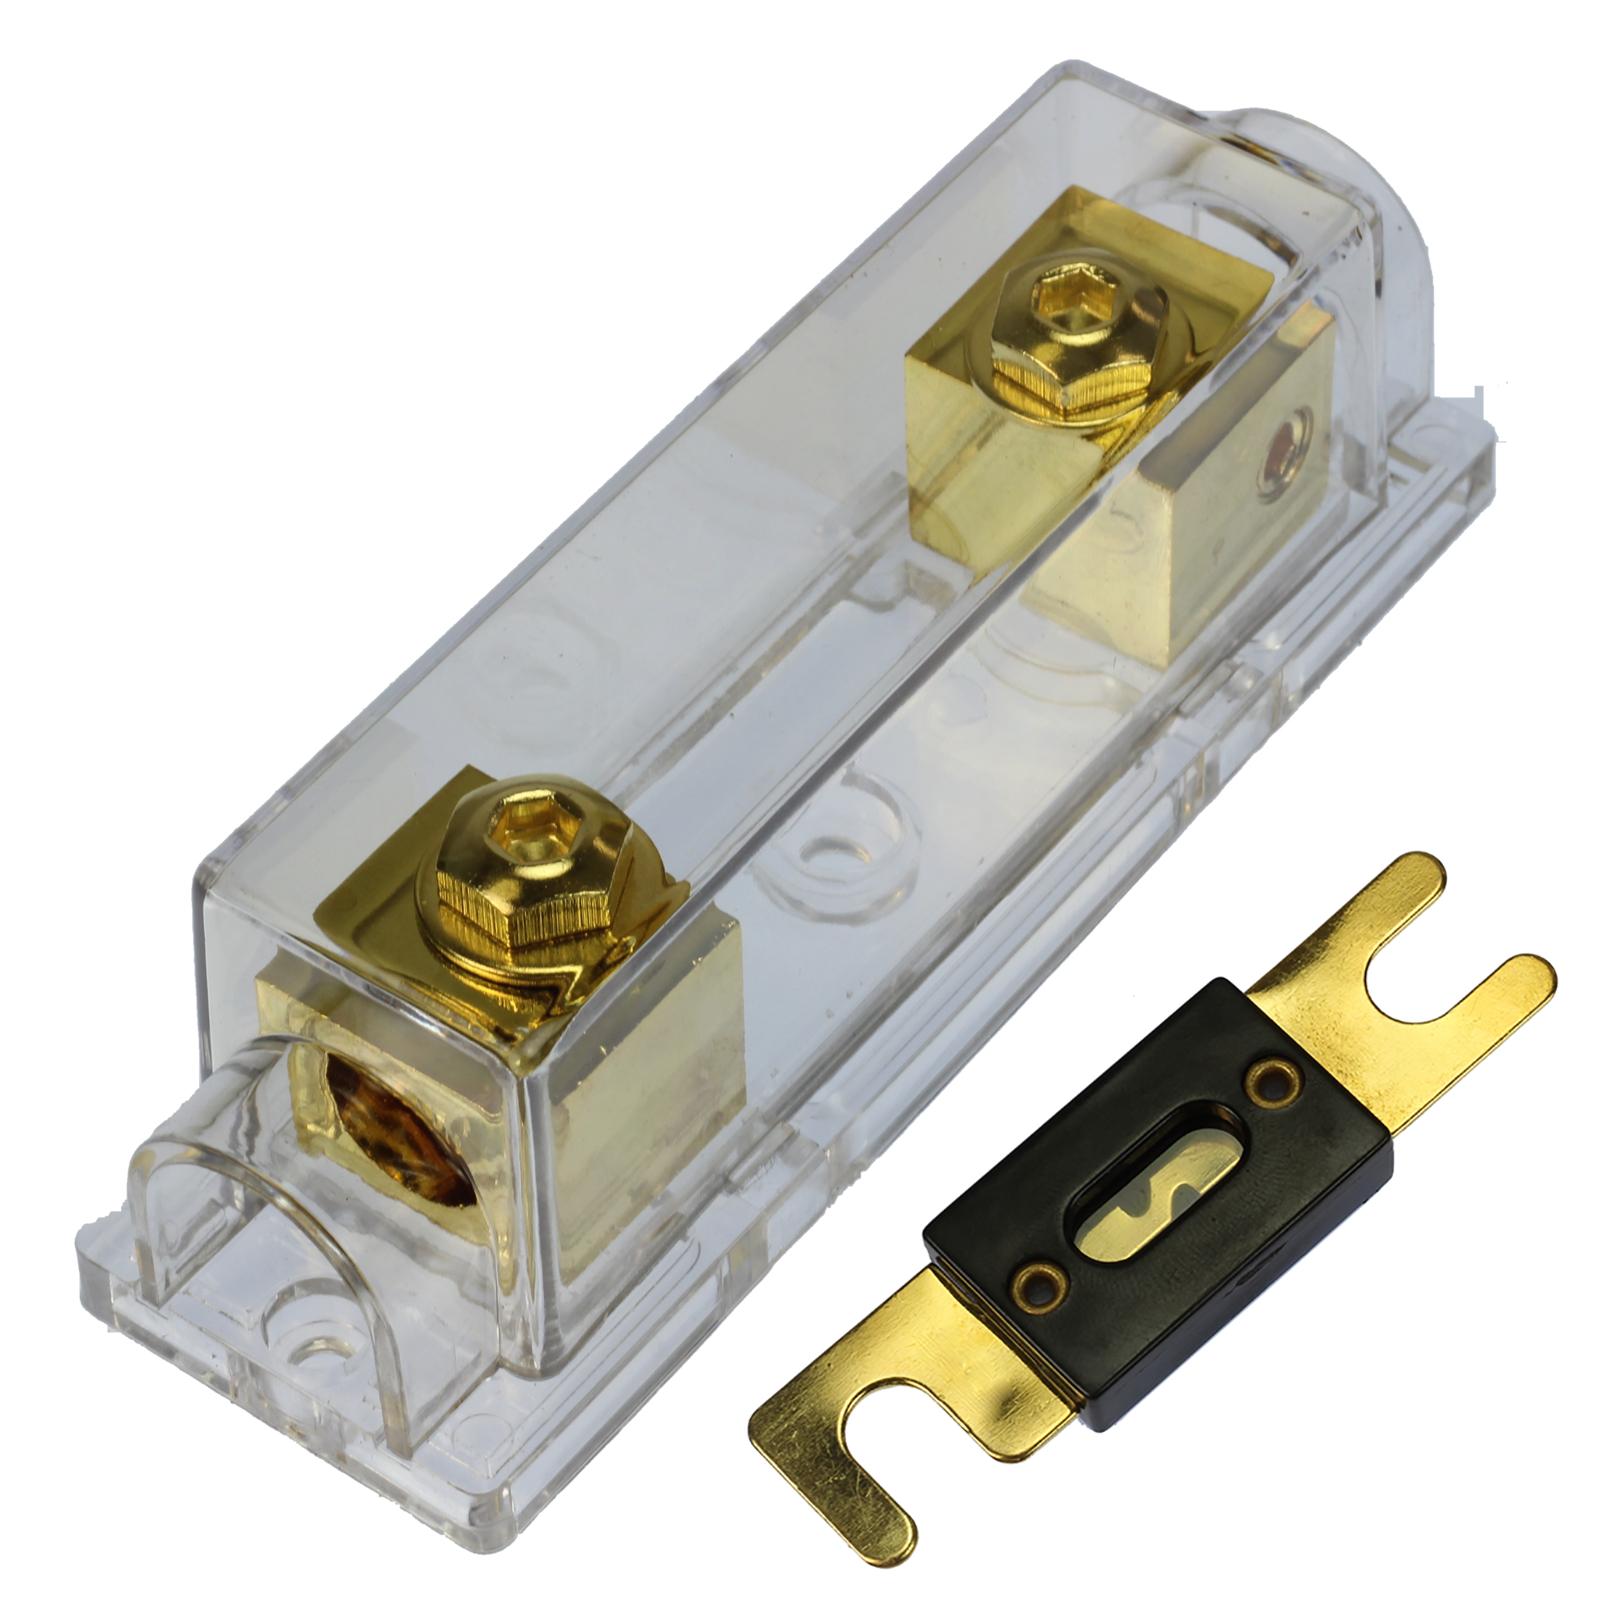 200 Amp ANL Fuse Gold Holder Voodoo 2/0 or 1/0 0 gauge no terminals needed